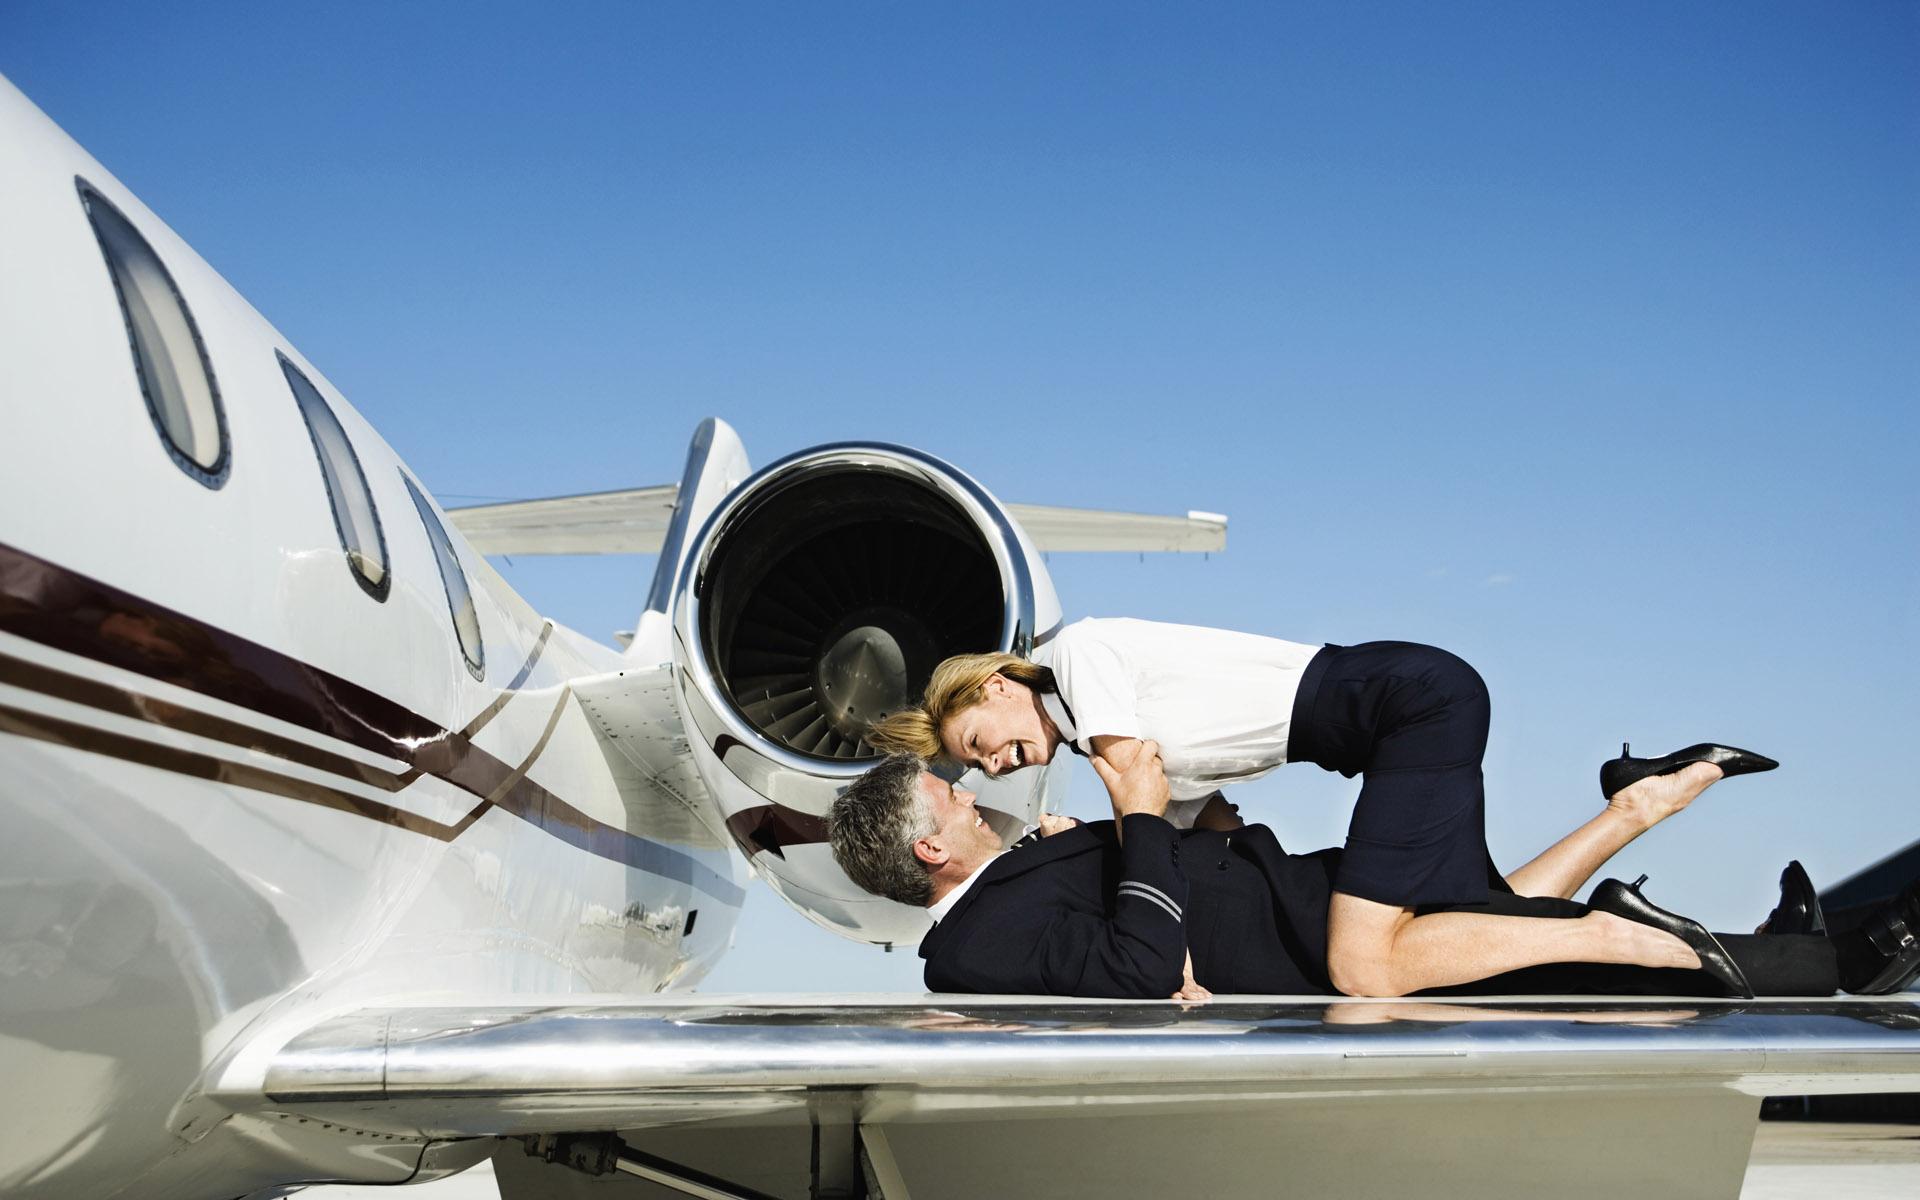 Приятного полета картинки юмор